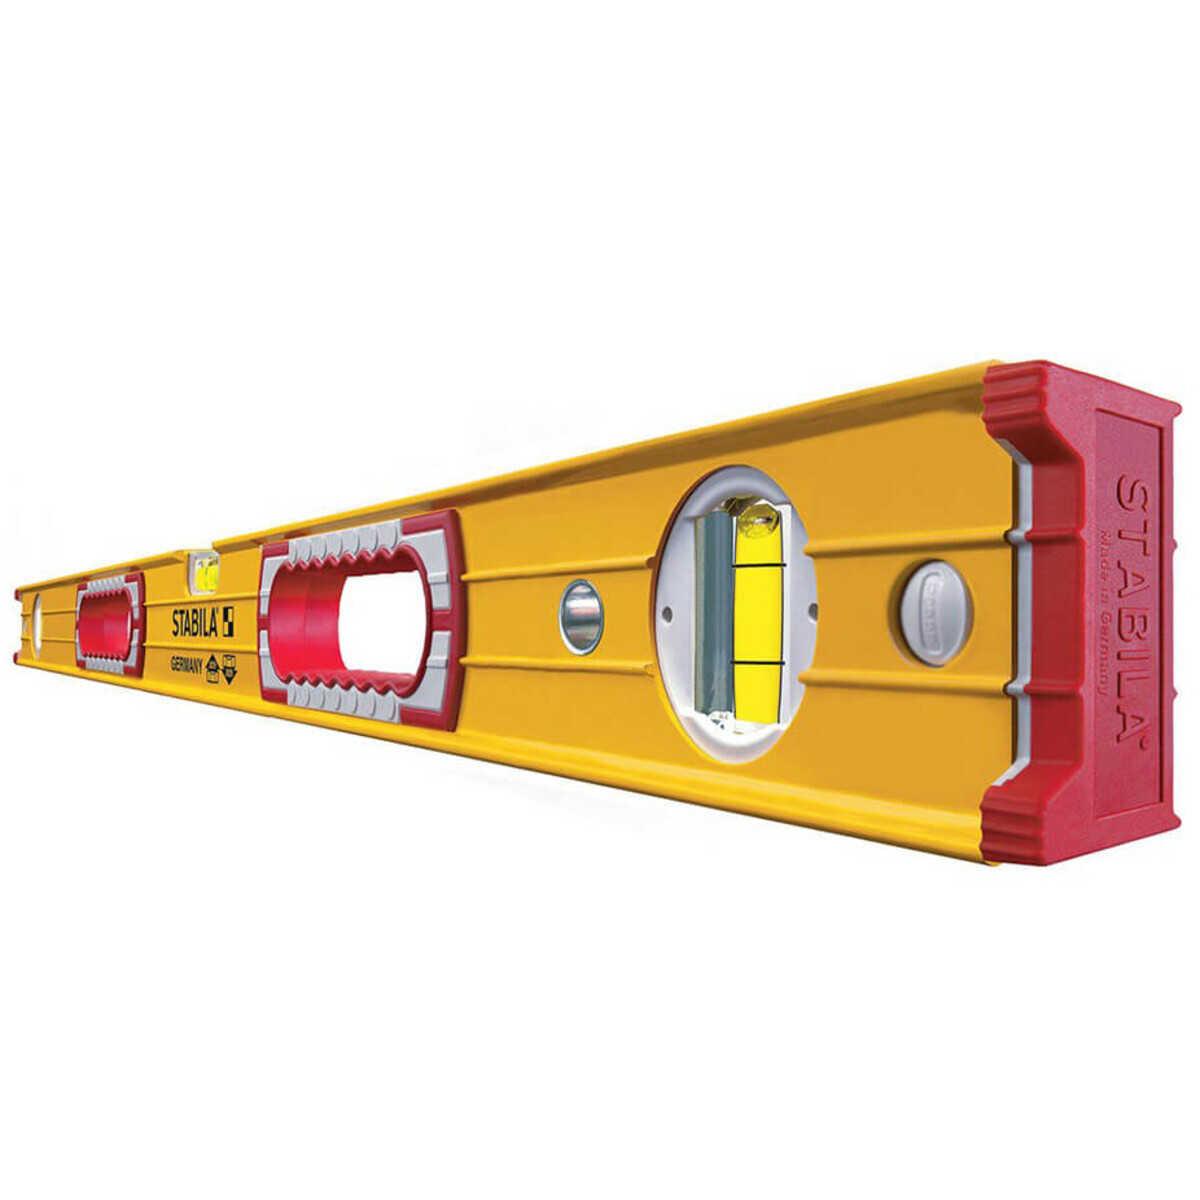 Stabila Type 196 Construction Level